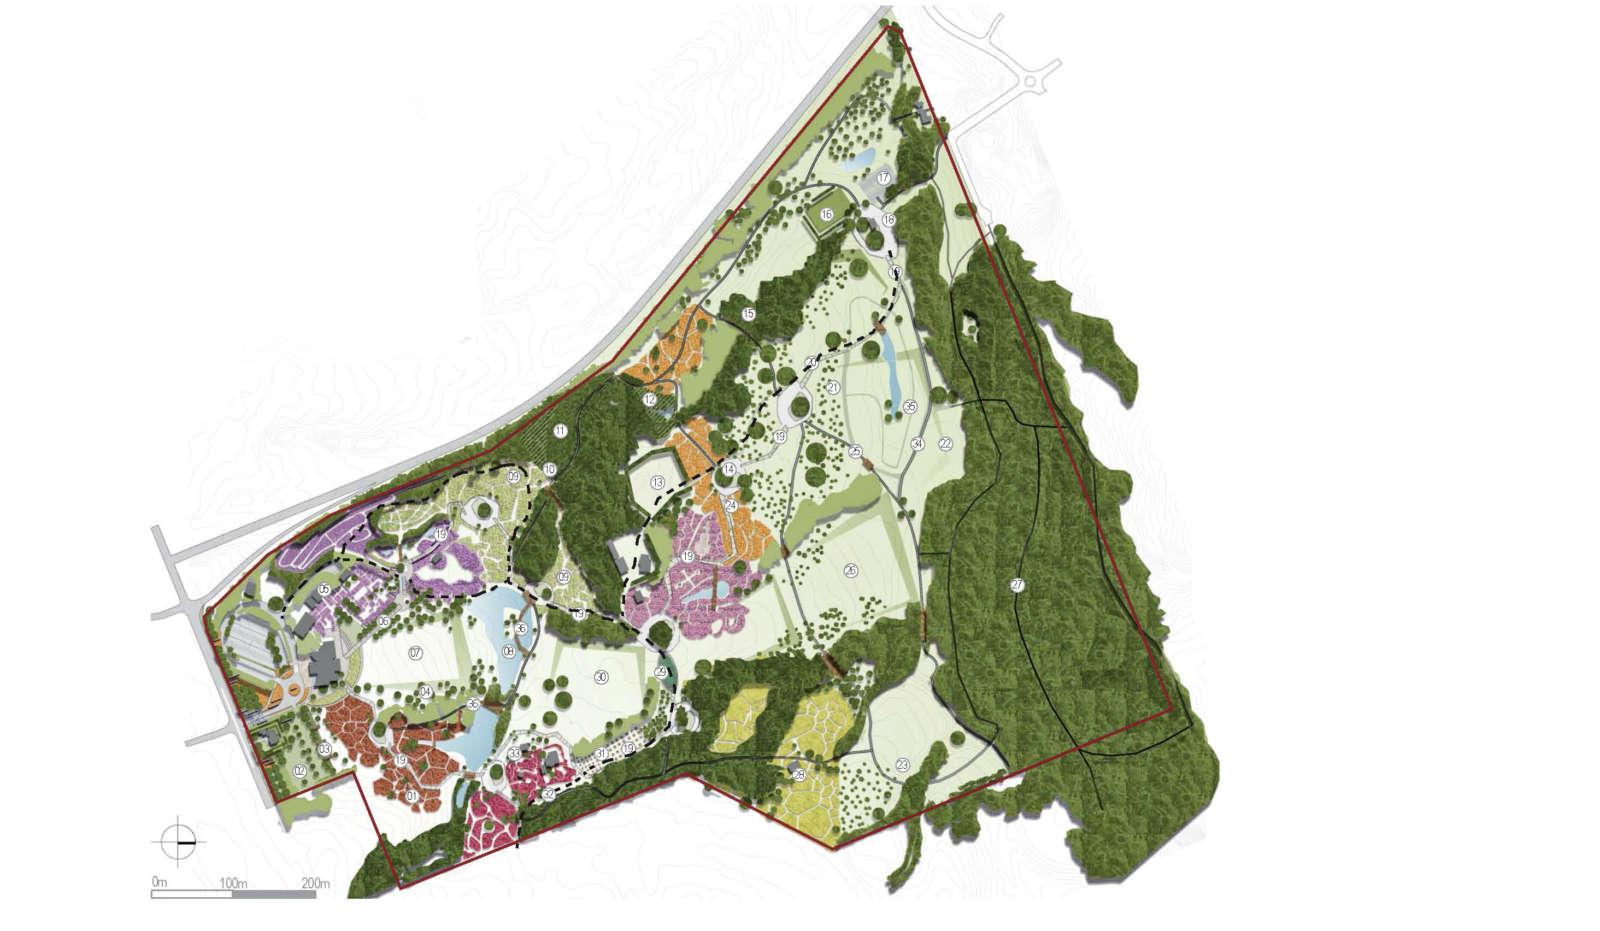 Isthmus Auckland Botatic Garden Master Plan